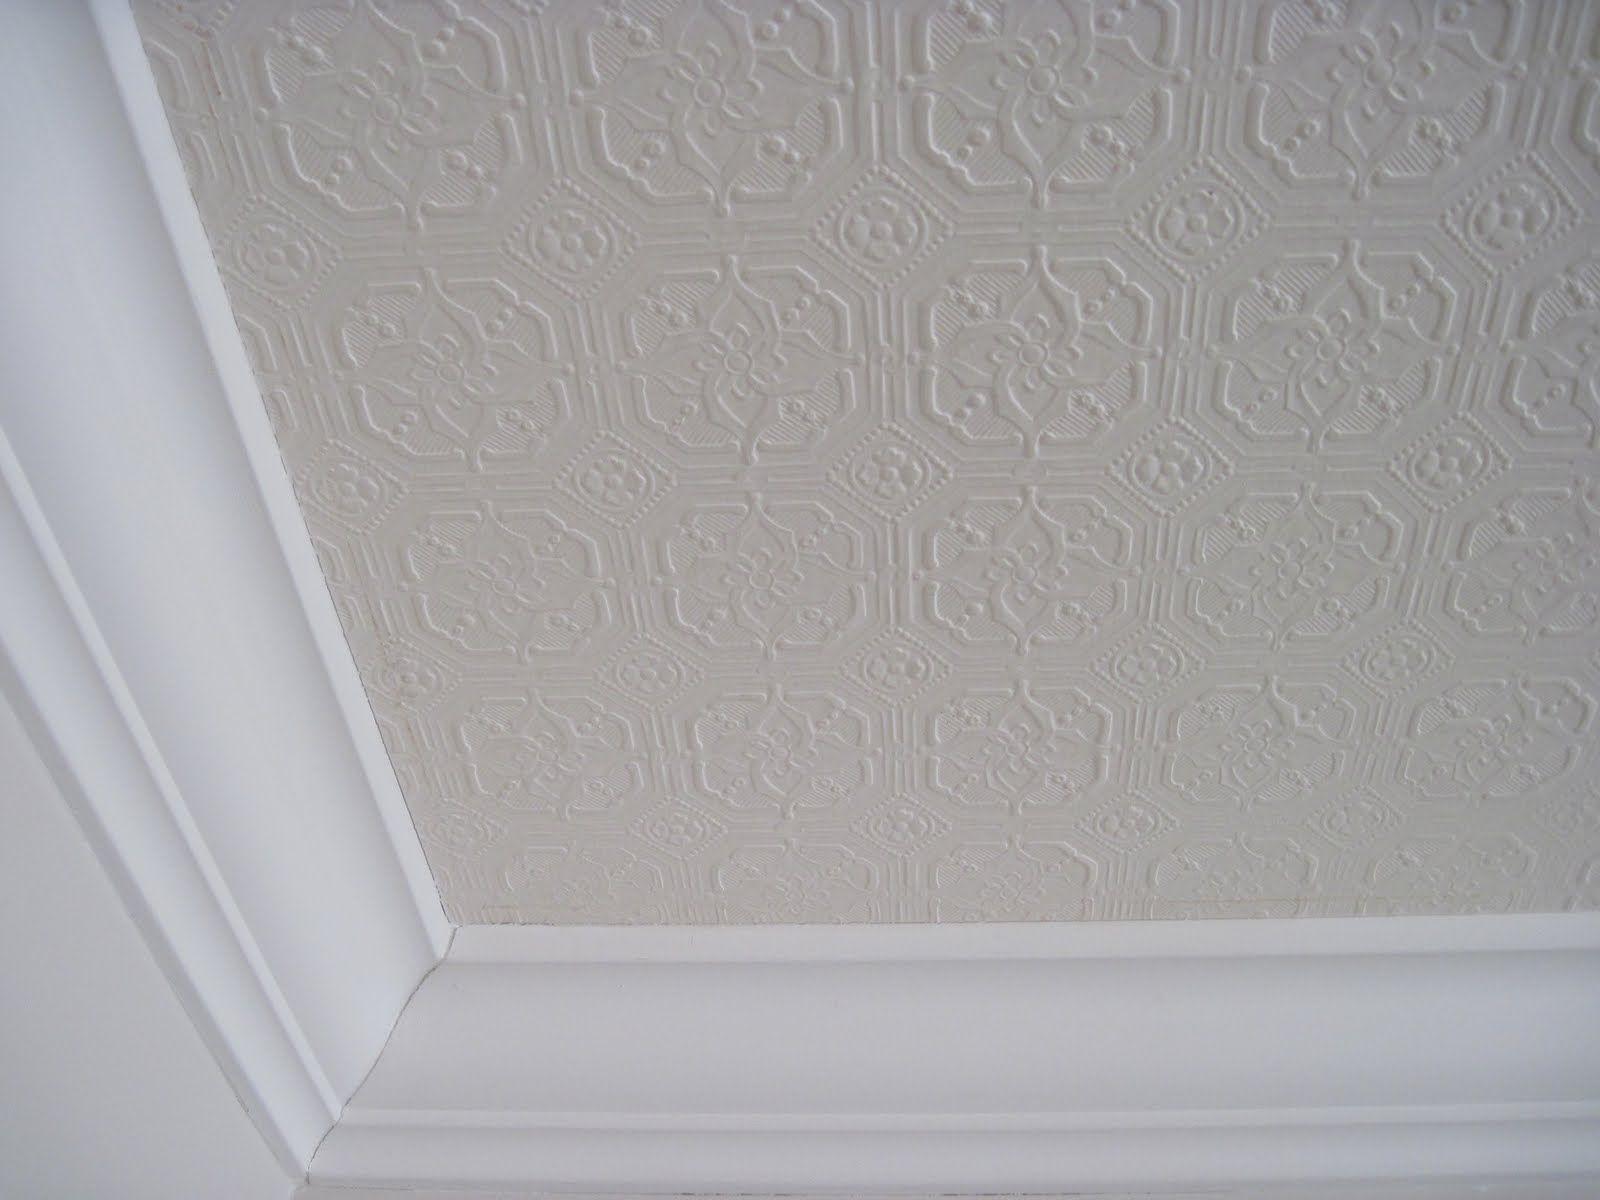 7 Ceilings Design Ideas For 2017   Tin ceilings, Textured ...